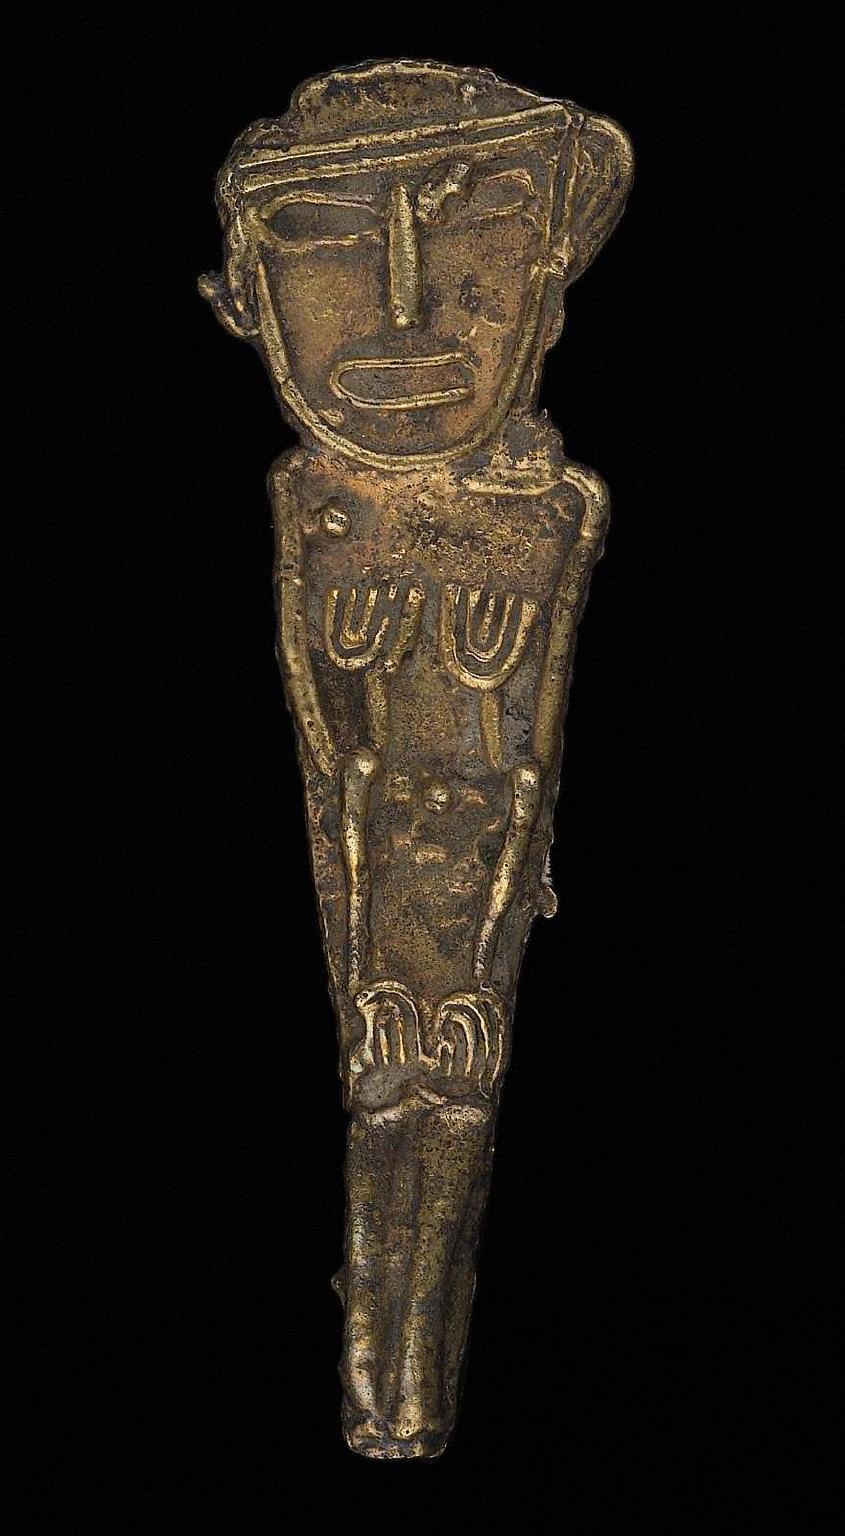 Seated male effigy figure